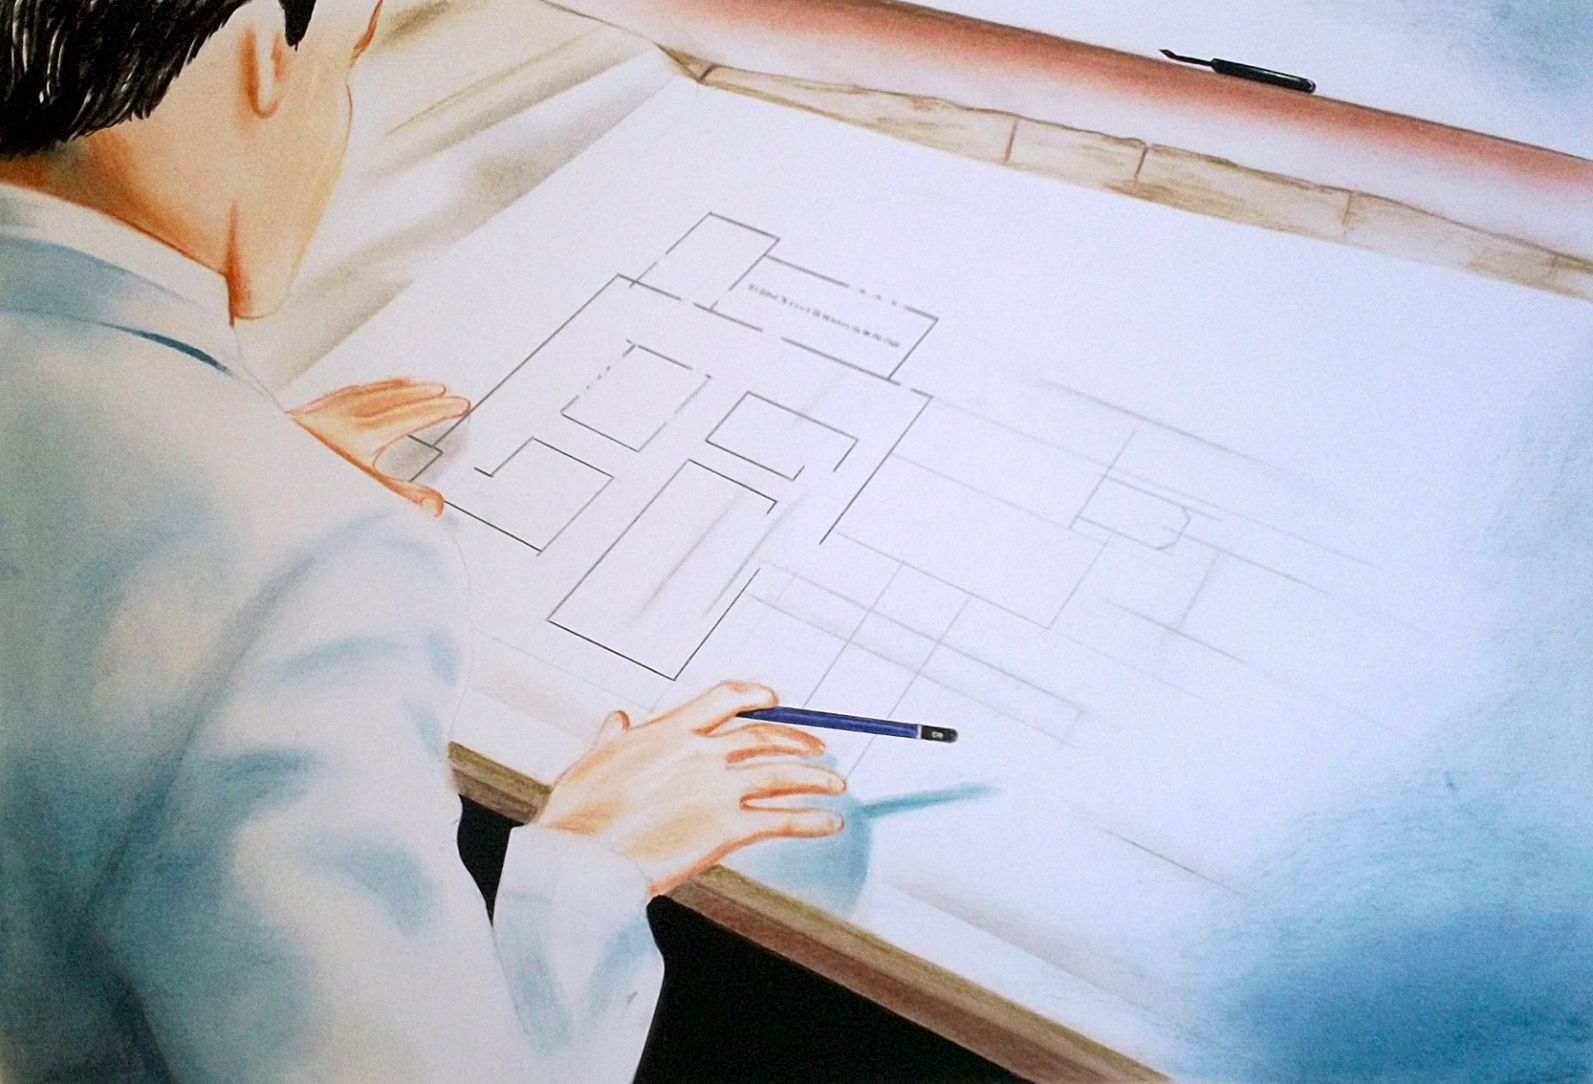 Architect (2011) Lápiz y pastel sobre papel. Medidas 30 x 40 cm.